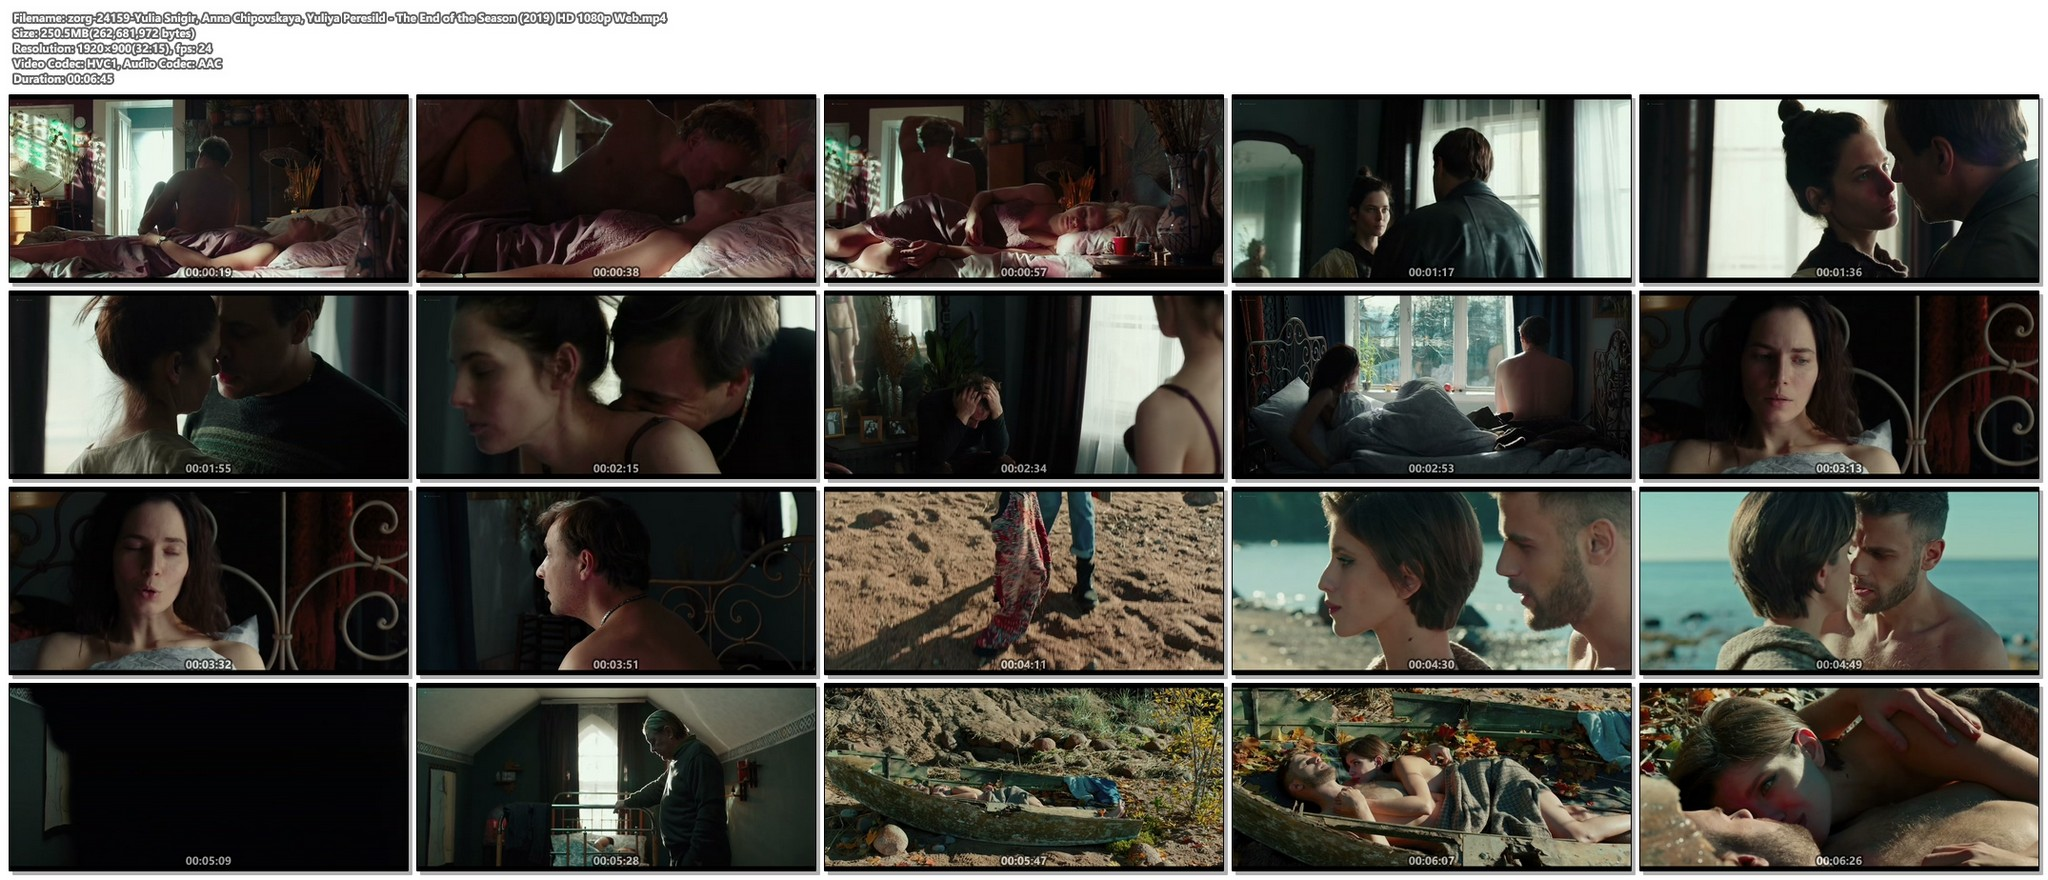 Yulia Snigir hot and some sex Anna Chipovskaya, Yuliya Peresild sexy - The End of the Season (2019) HD 1080p Web (1)